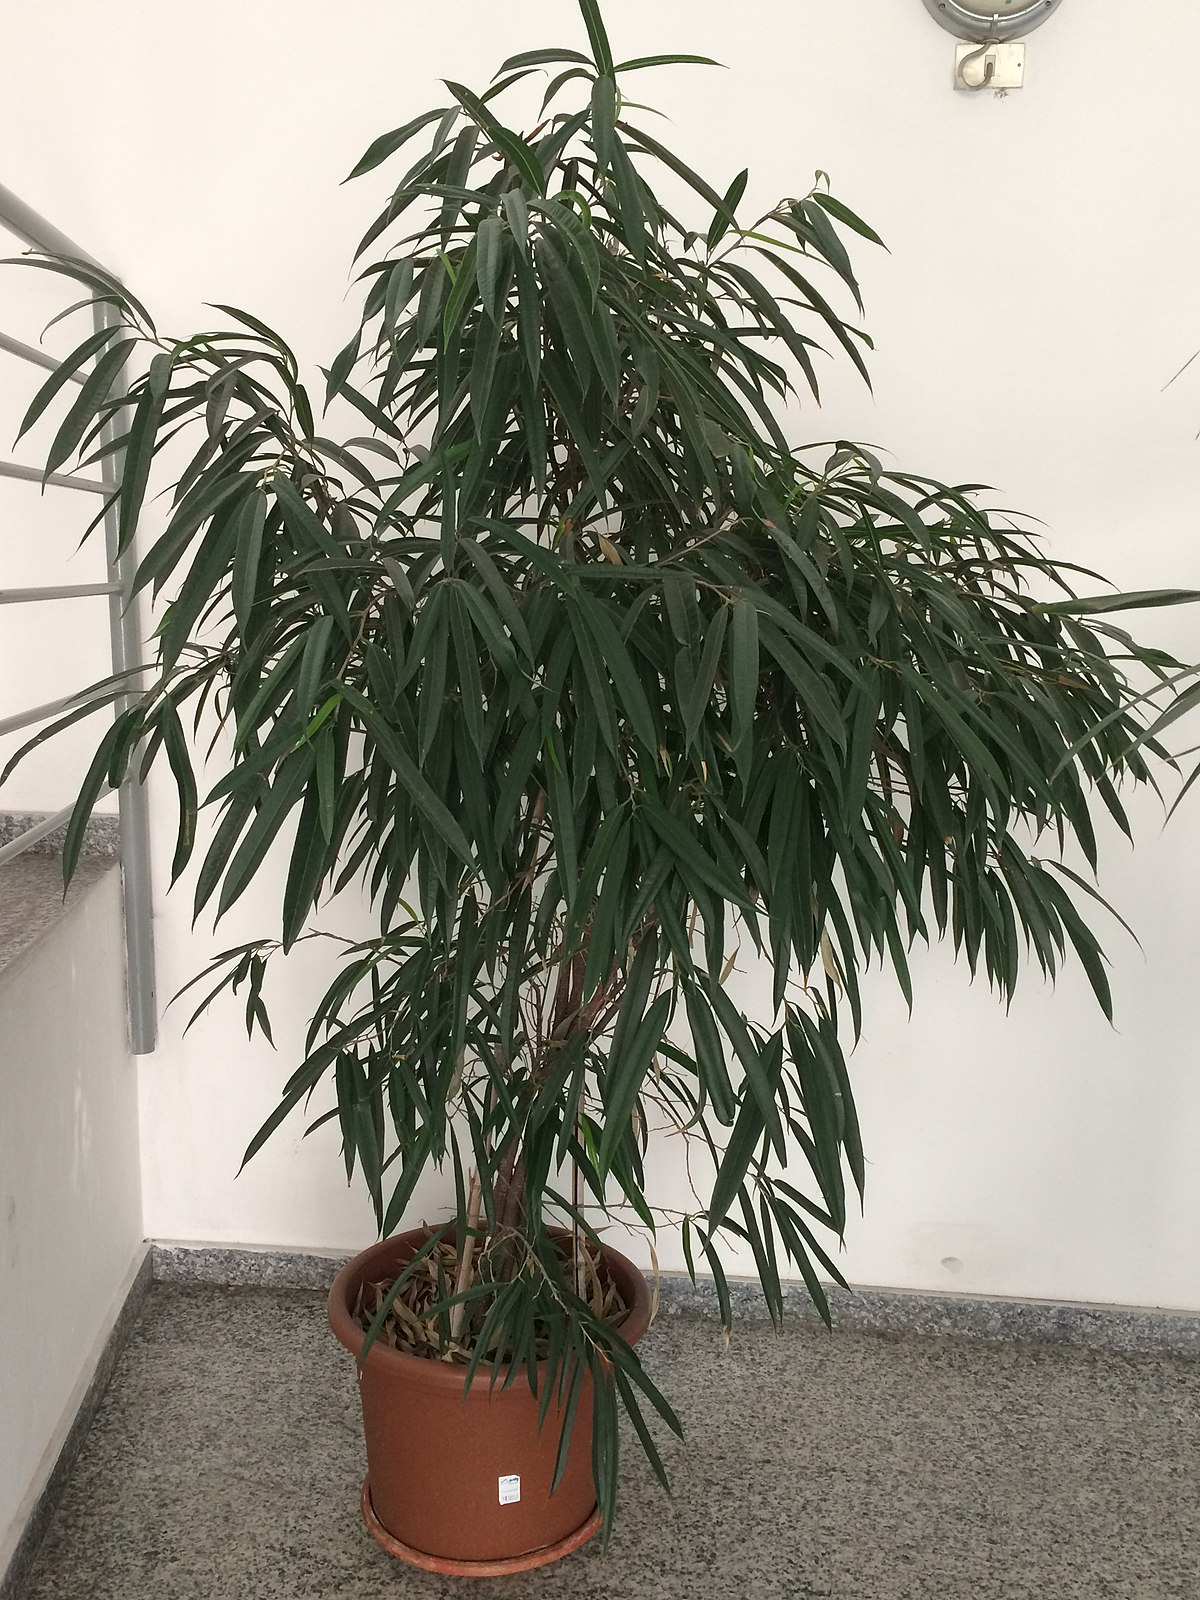 Ficus maclellandii Alii (Ficus binnendijkii Alii).jpg